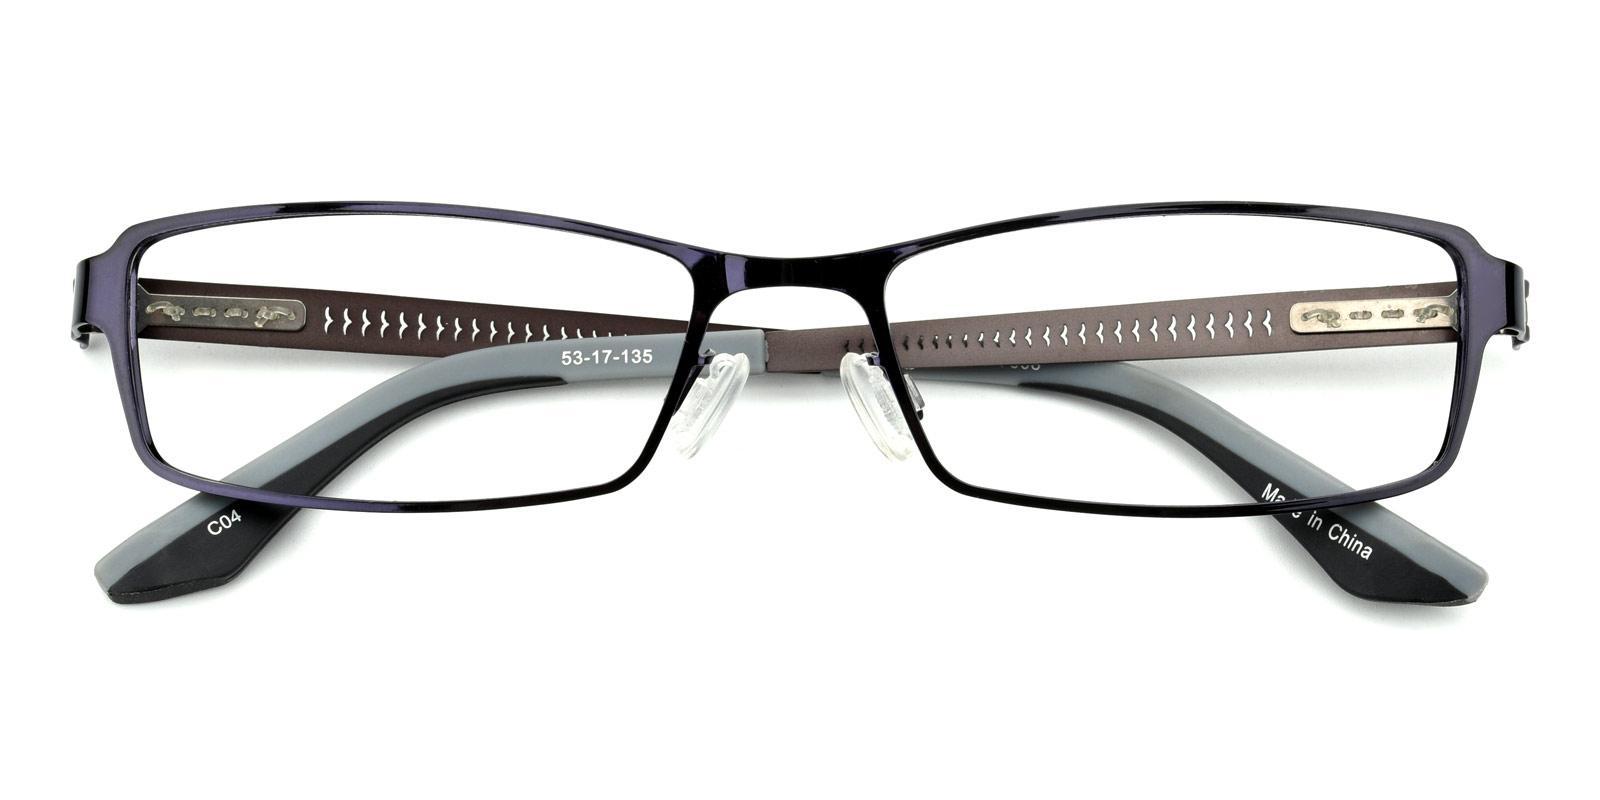 Benson-Black-Rectangle-Metal-Eyeglasses-detail